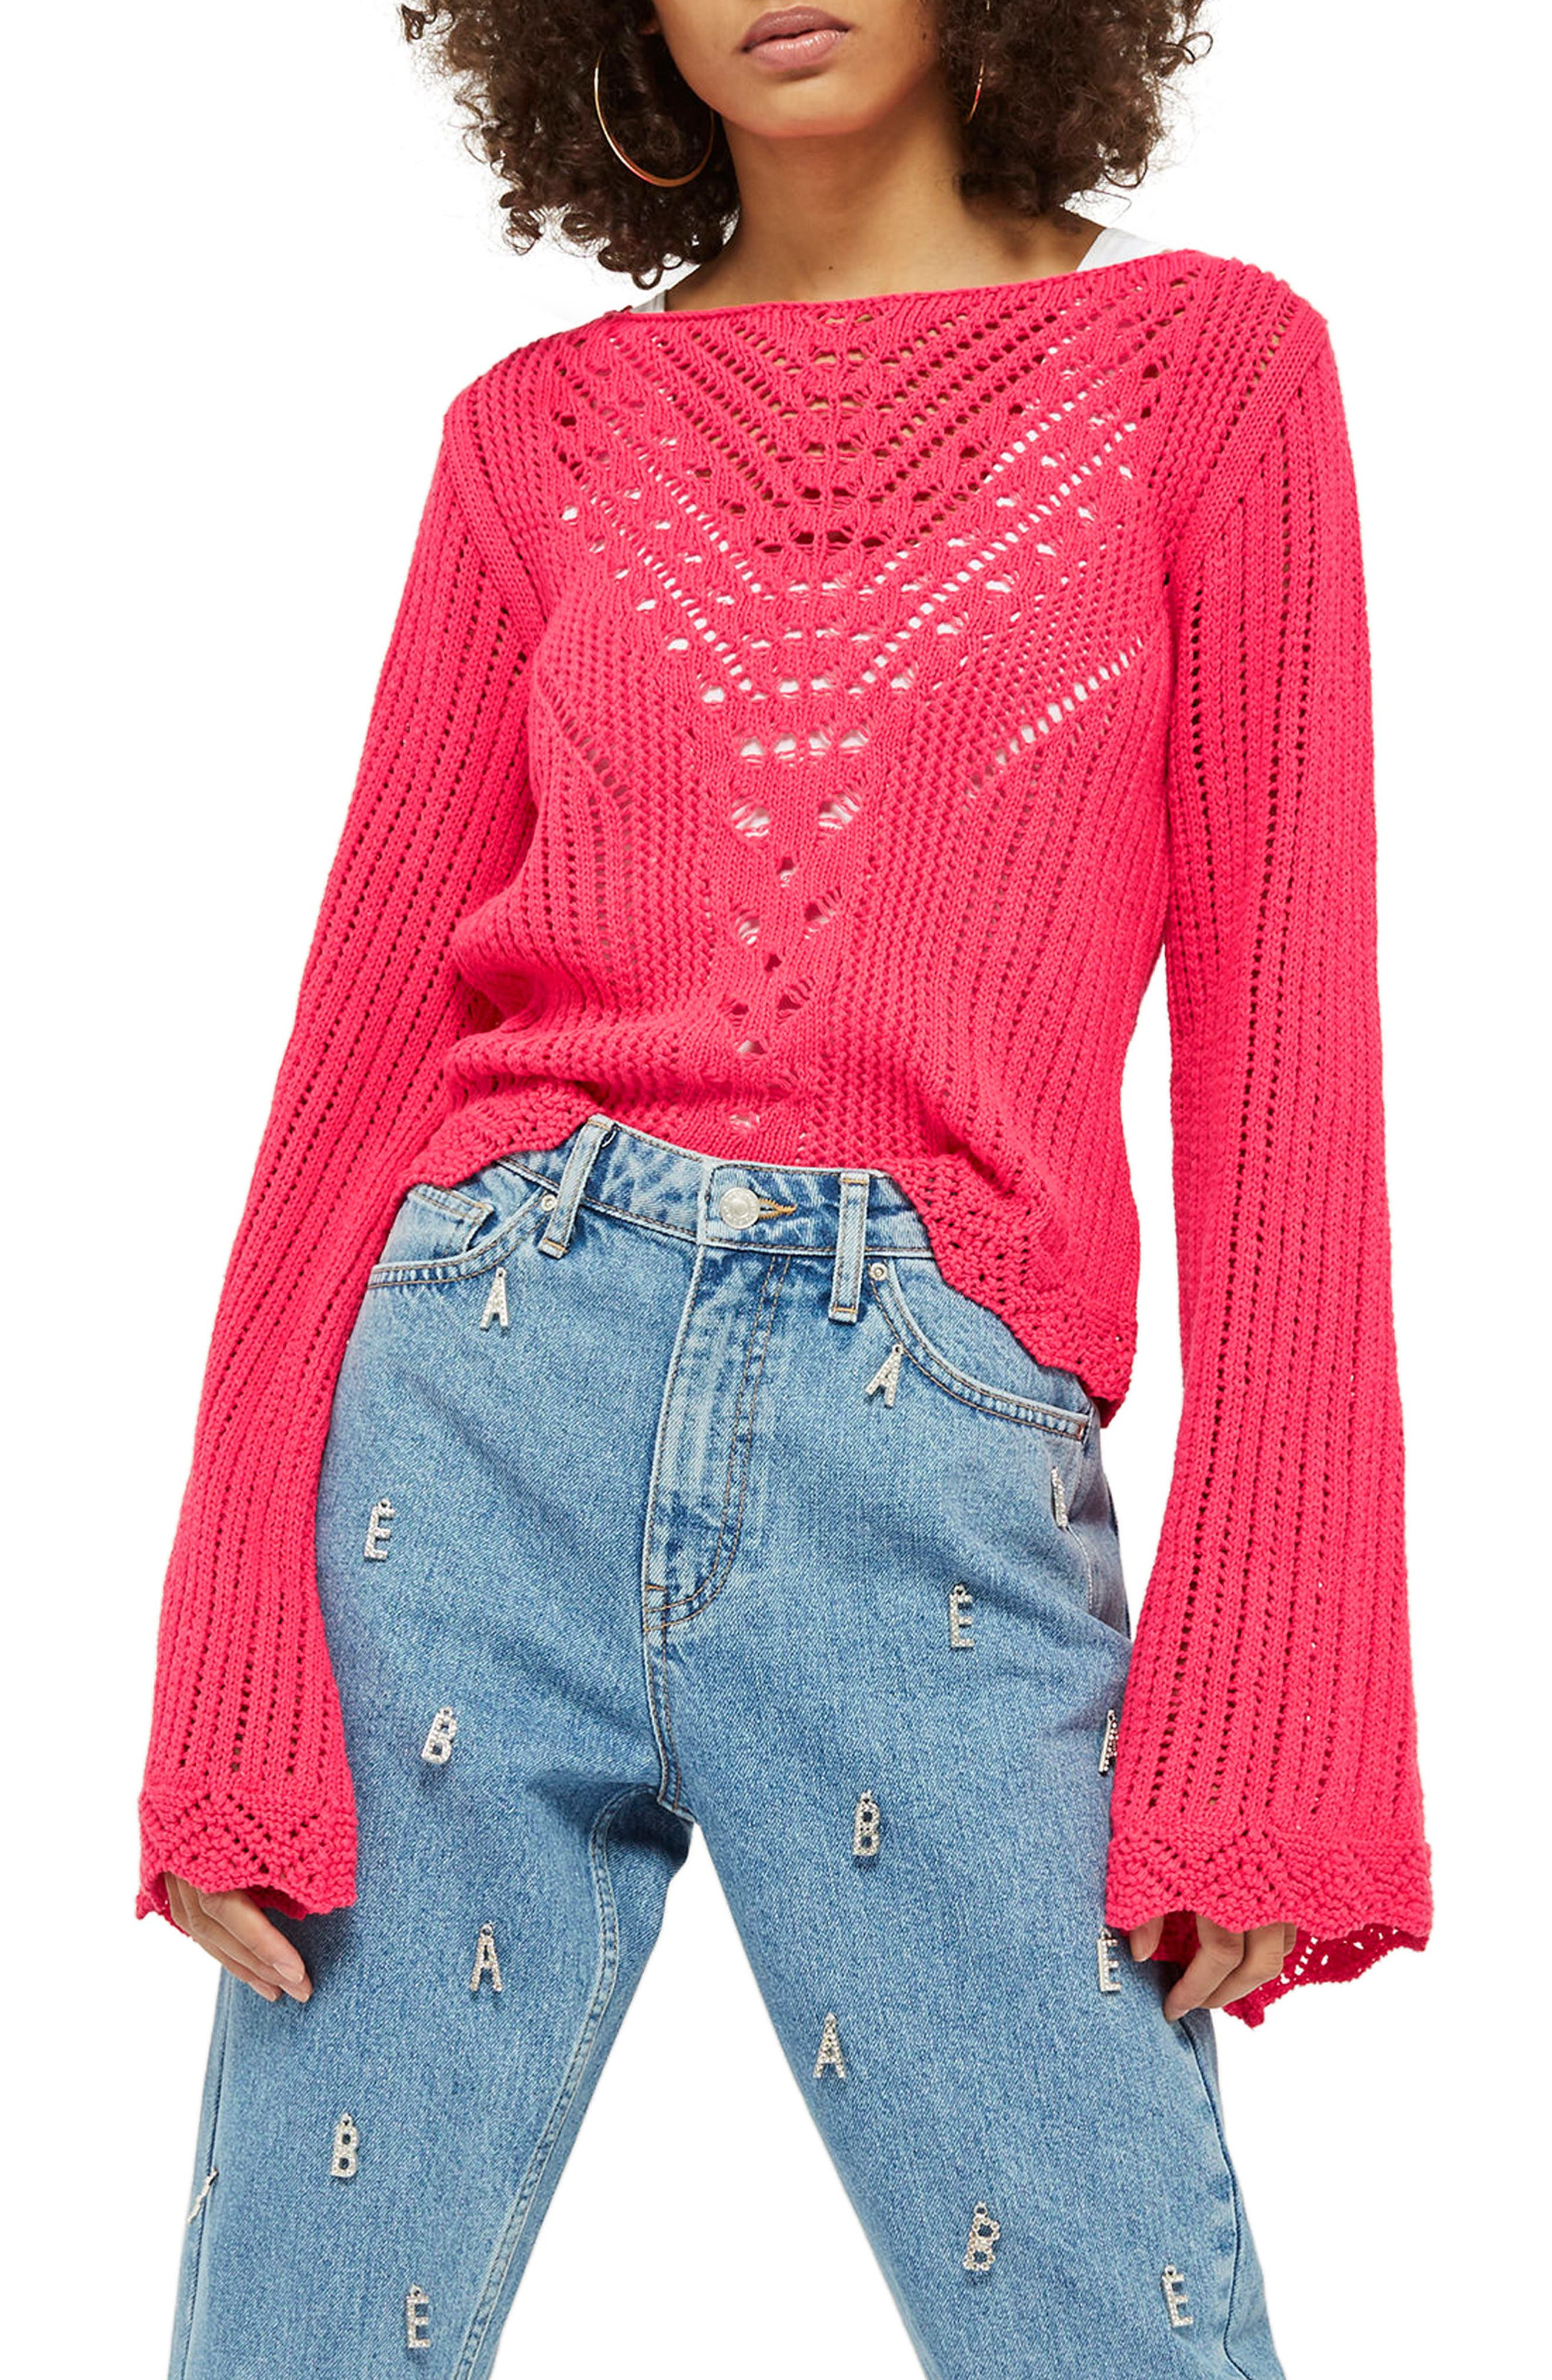 Topshop Tie Back Bell Sleeve Sweater